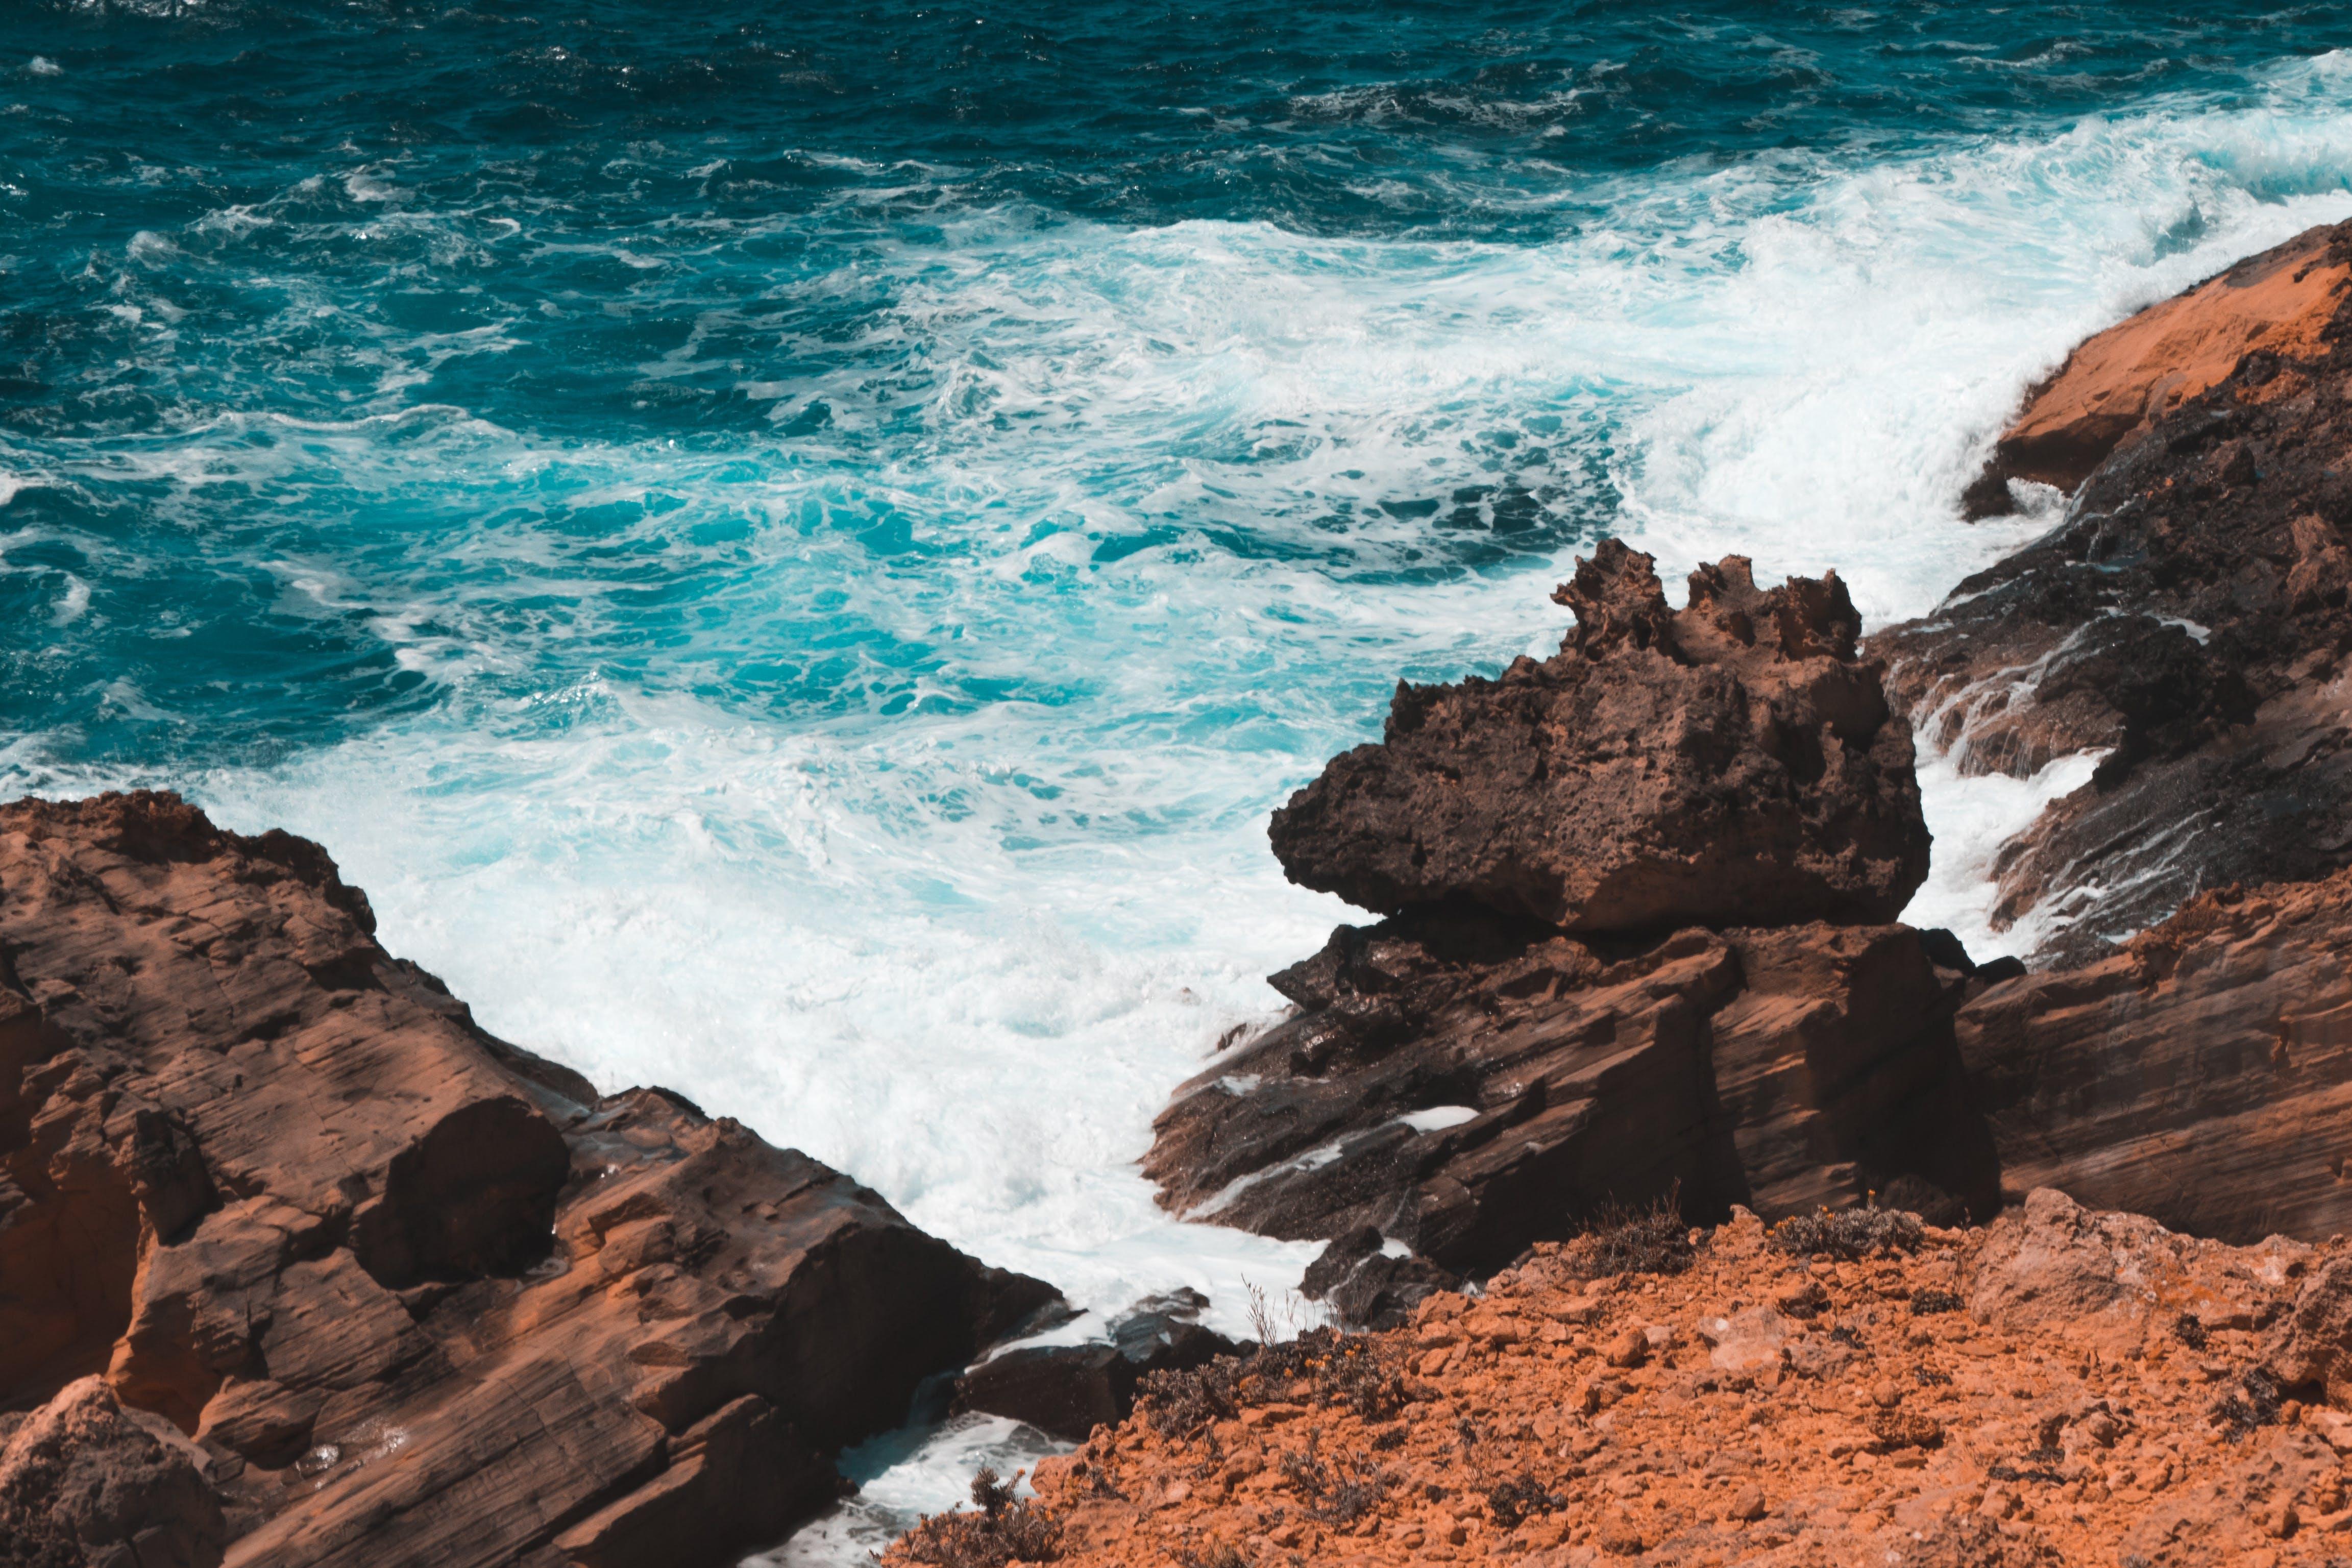 Photo of Rocks Formation on Seashore